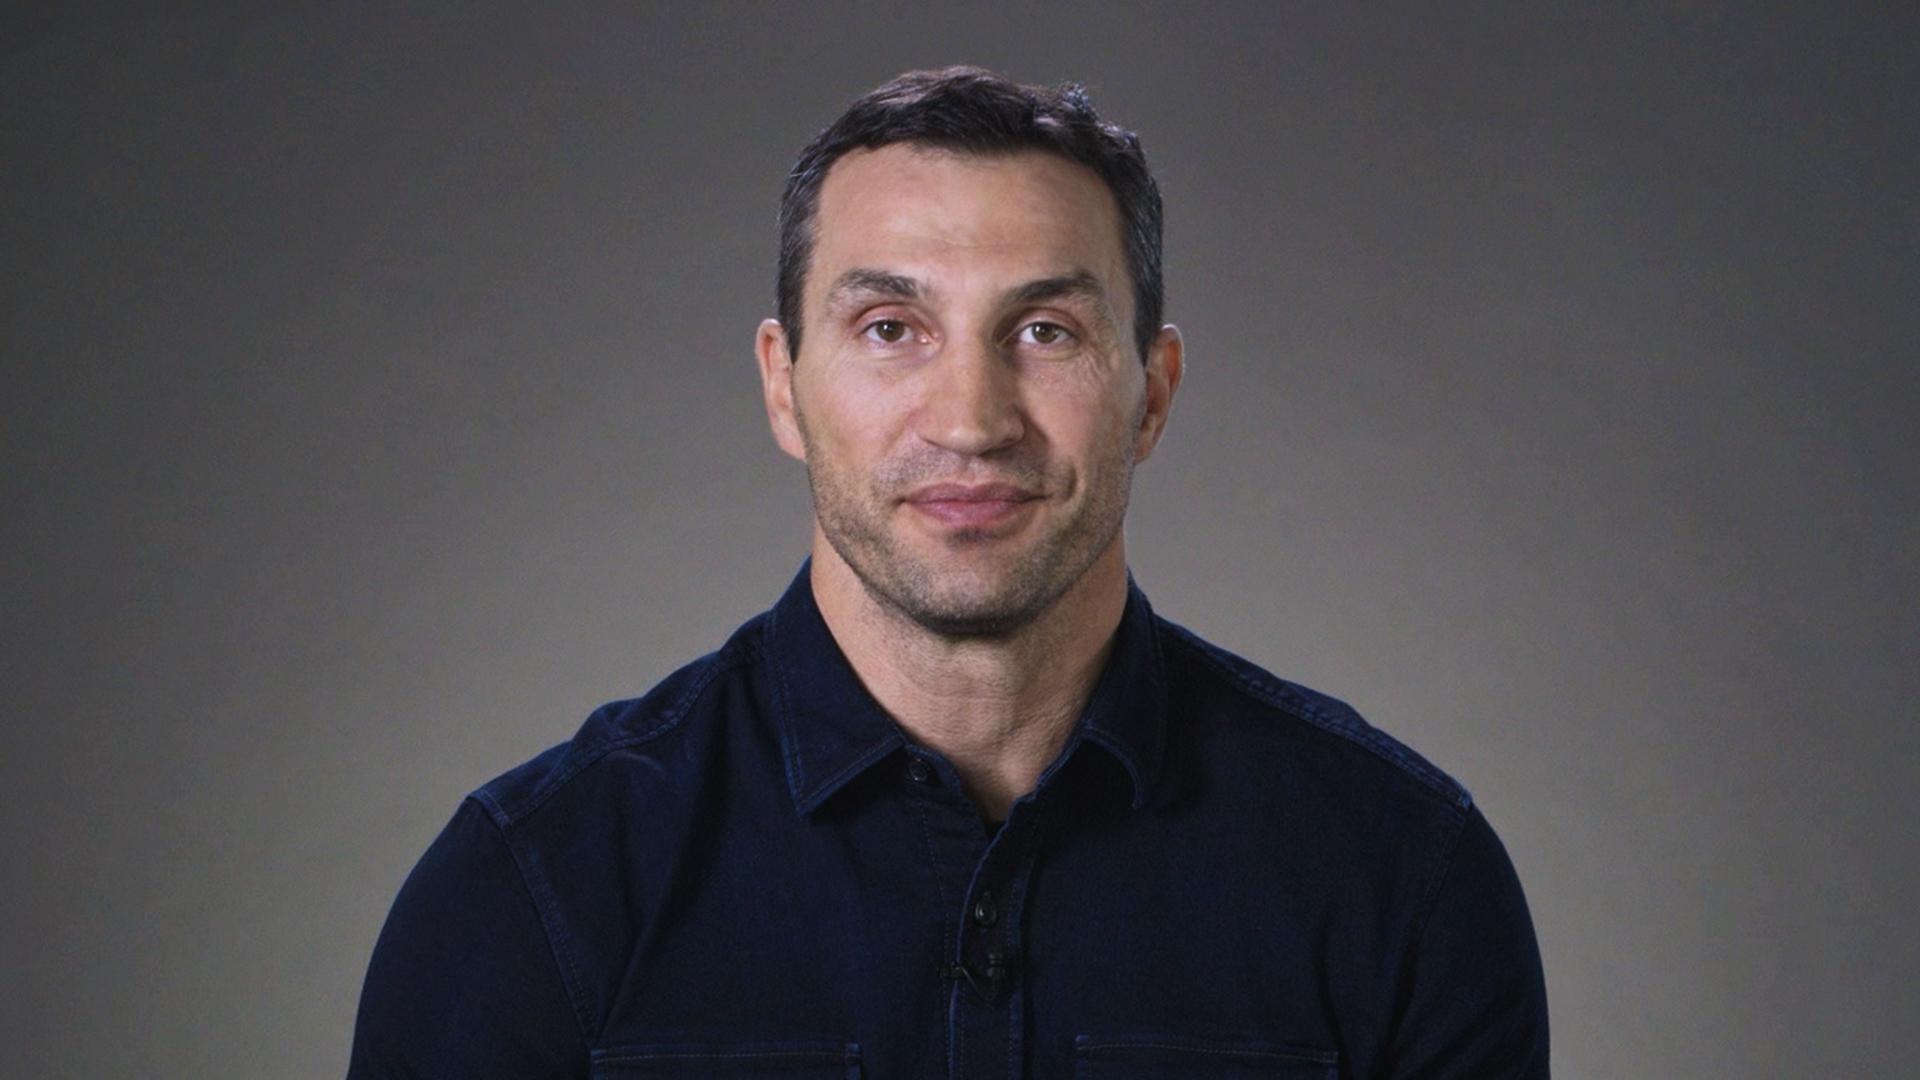 Legendary Heavyweight Boxer Wladimir Klitschko Explains How to